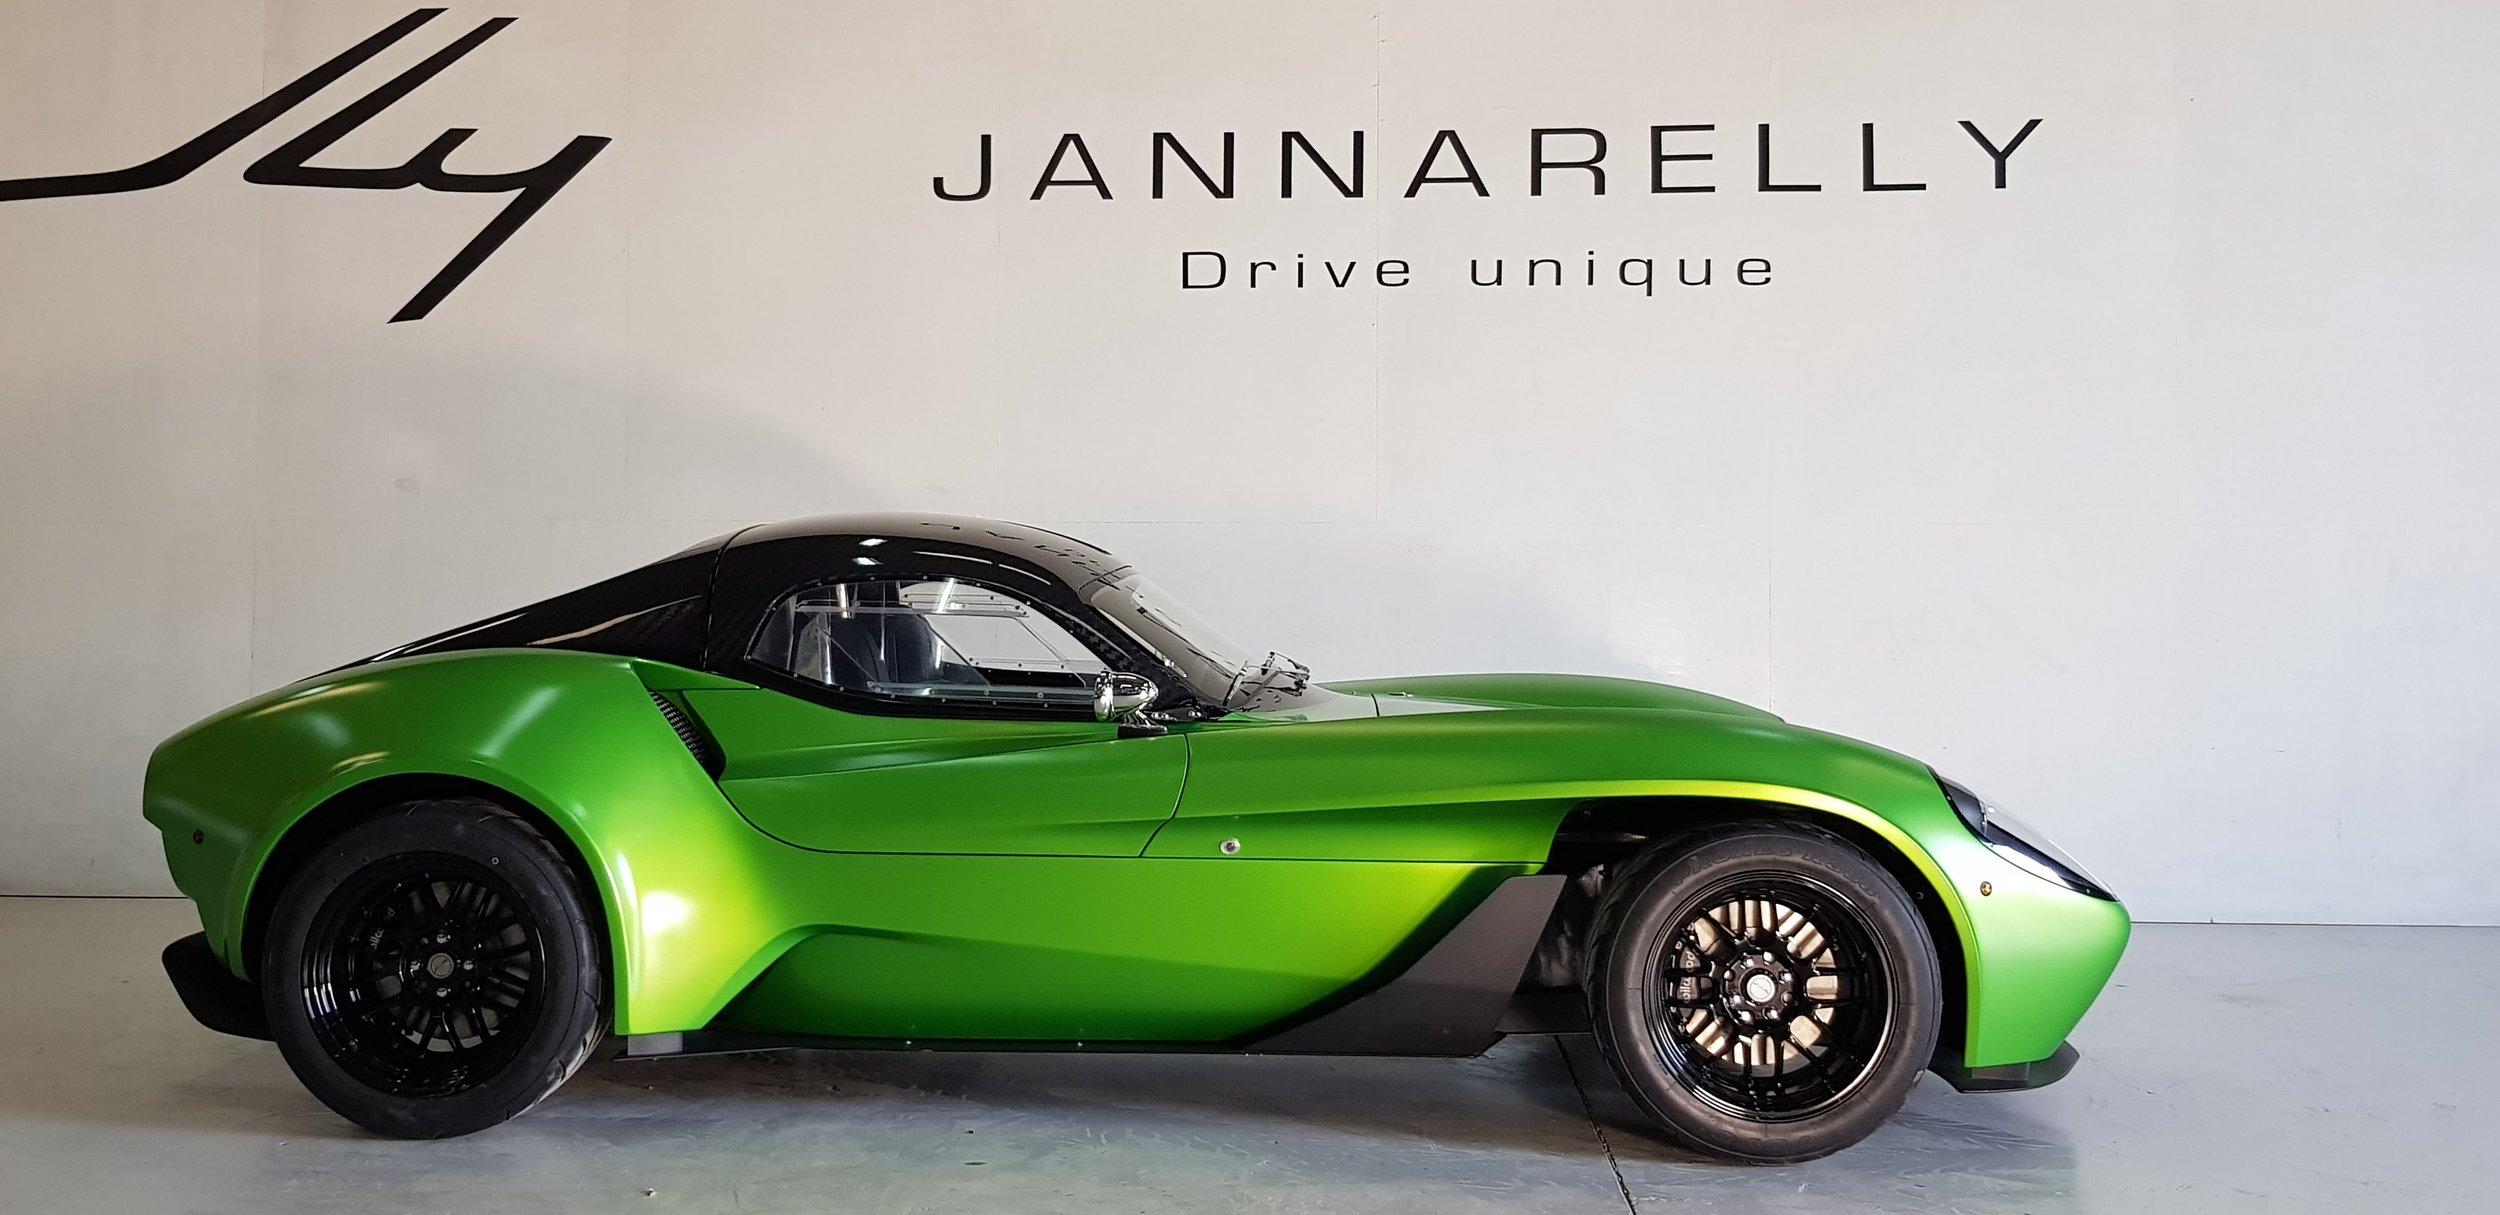 Jannarelly-France-Design-14.jpg